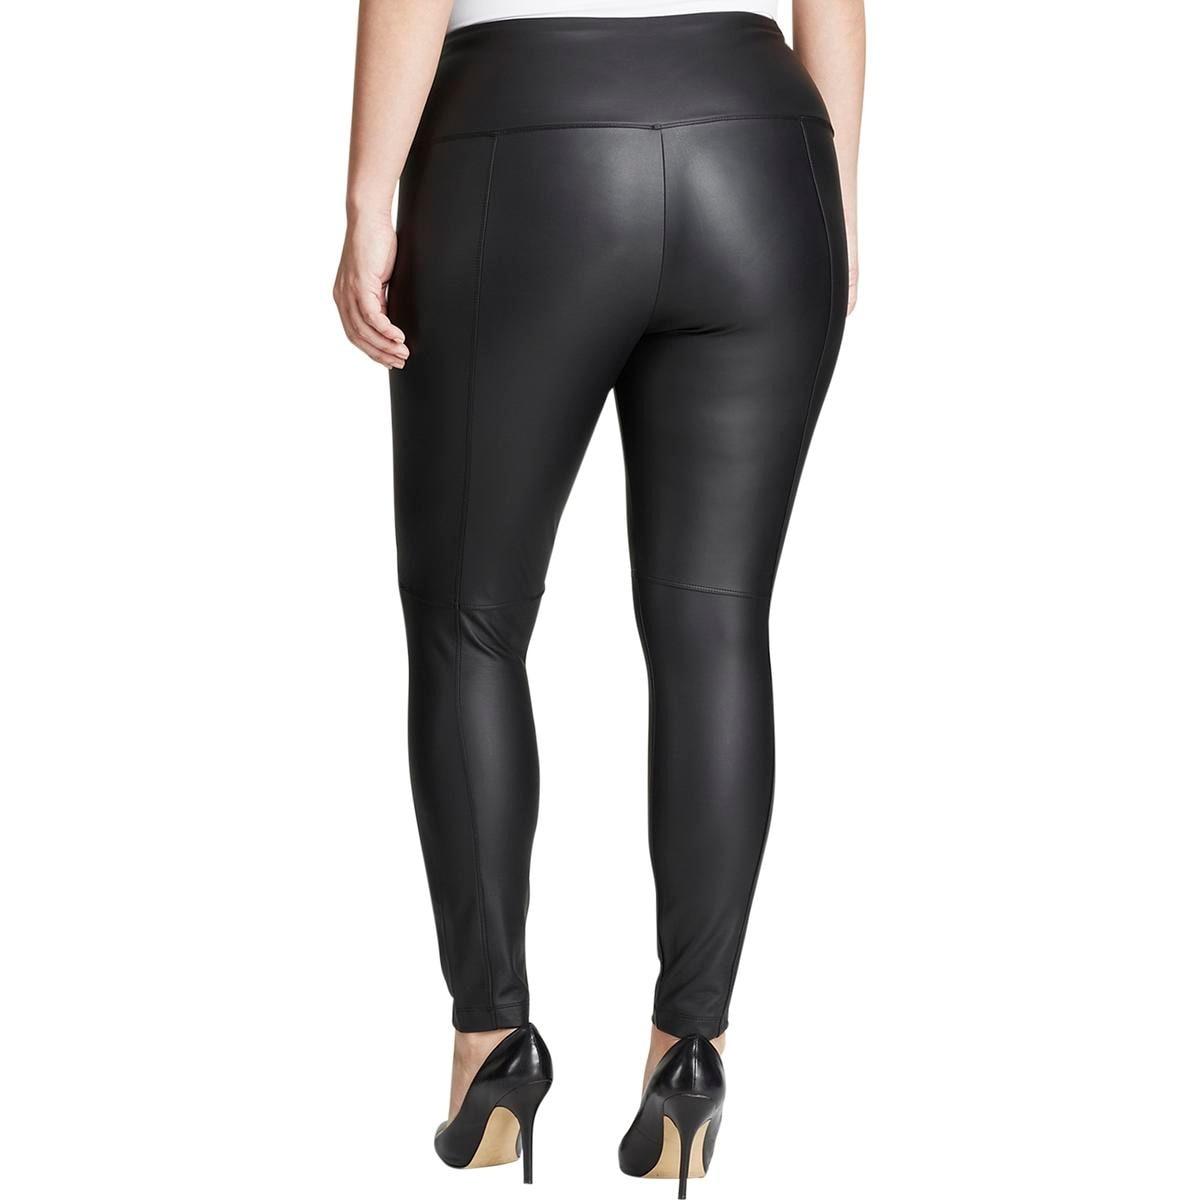 95edc353628dd8 Shop Lysse Womens Plus Leggings Vegan Leather High Waist - Free Shipping On  Orders Over $45 - Overstock - 14641009